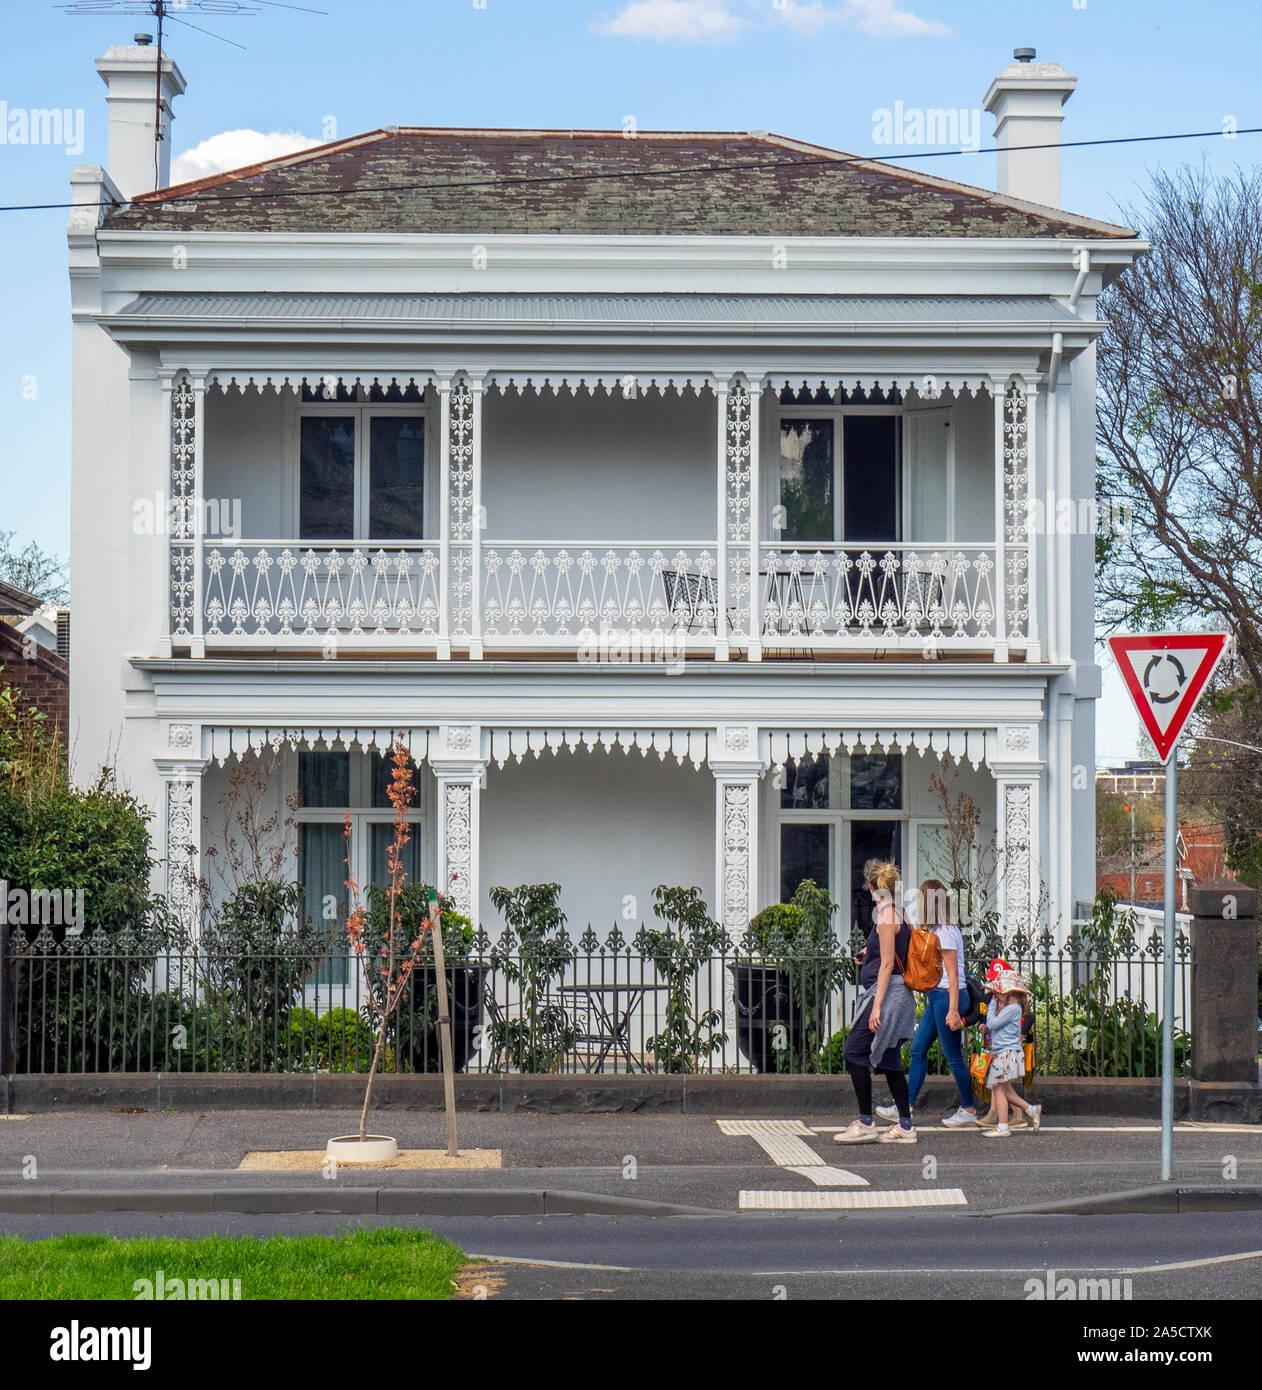 Style De Veranda Moderne australian architecture house veranda stock photos